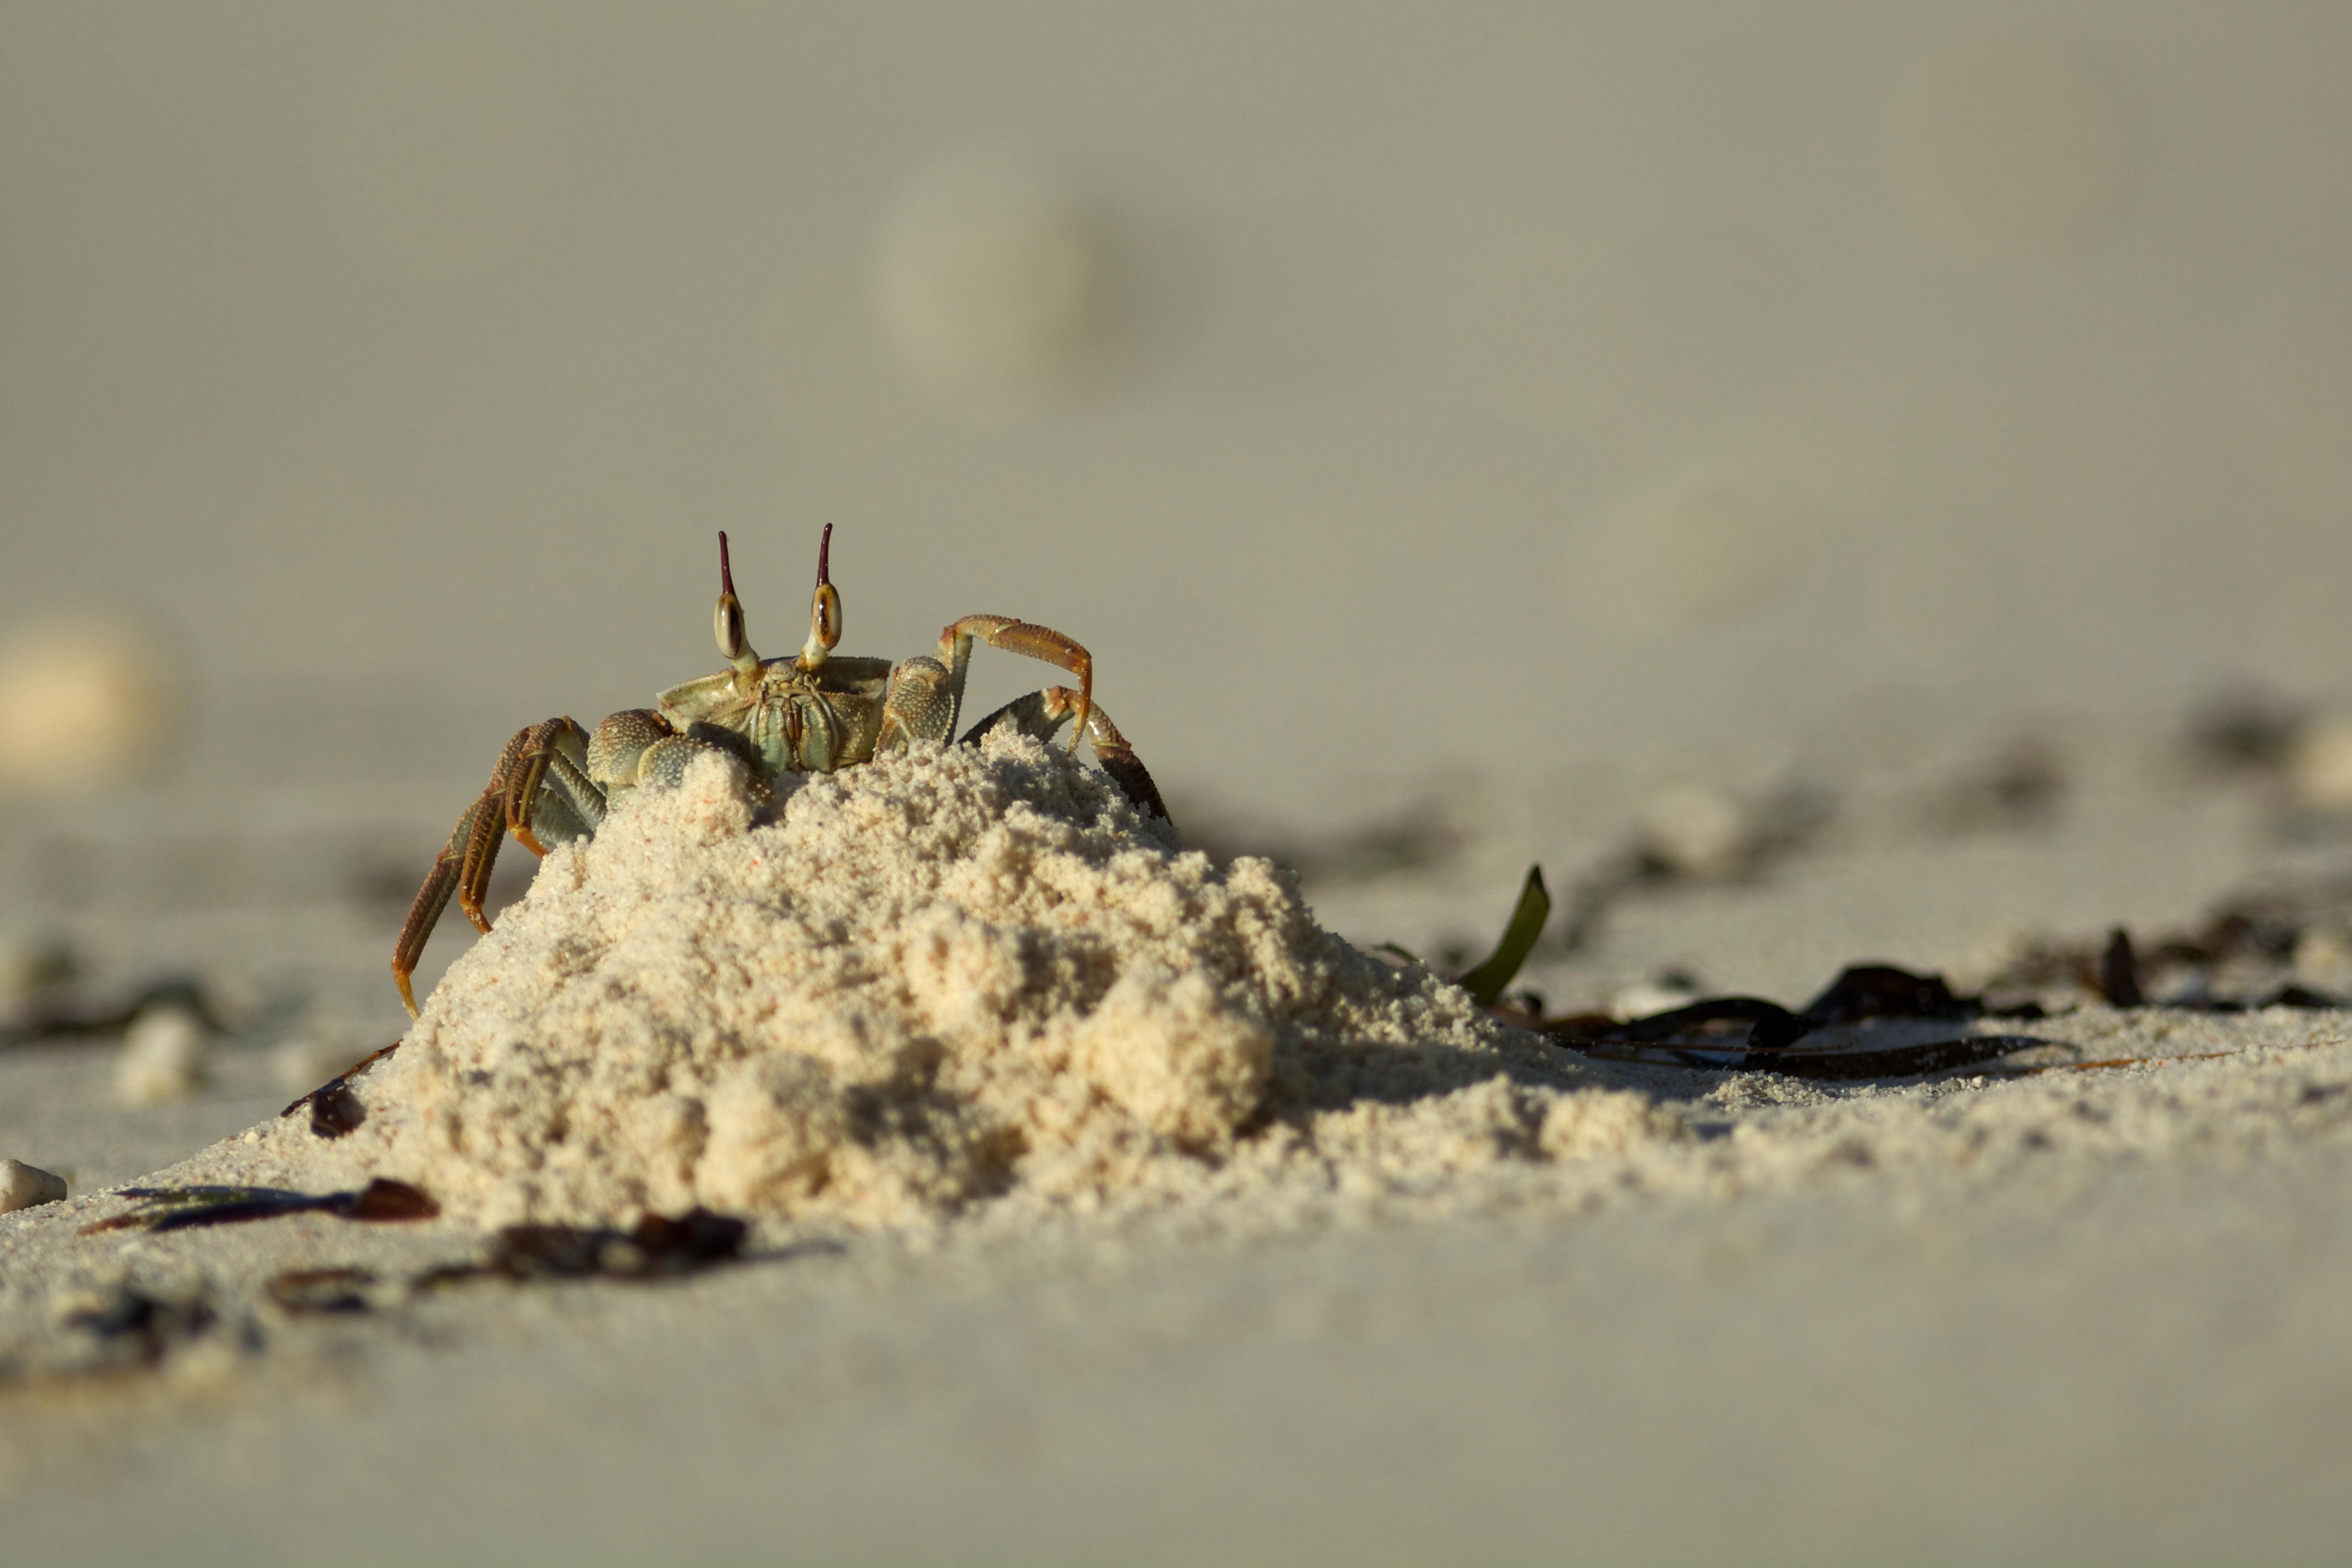 © Save Our Seas Foundation Copyright 2014 - Photograph by Rainer von Brandis